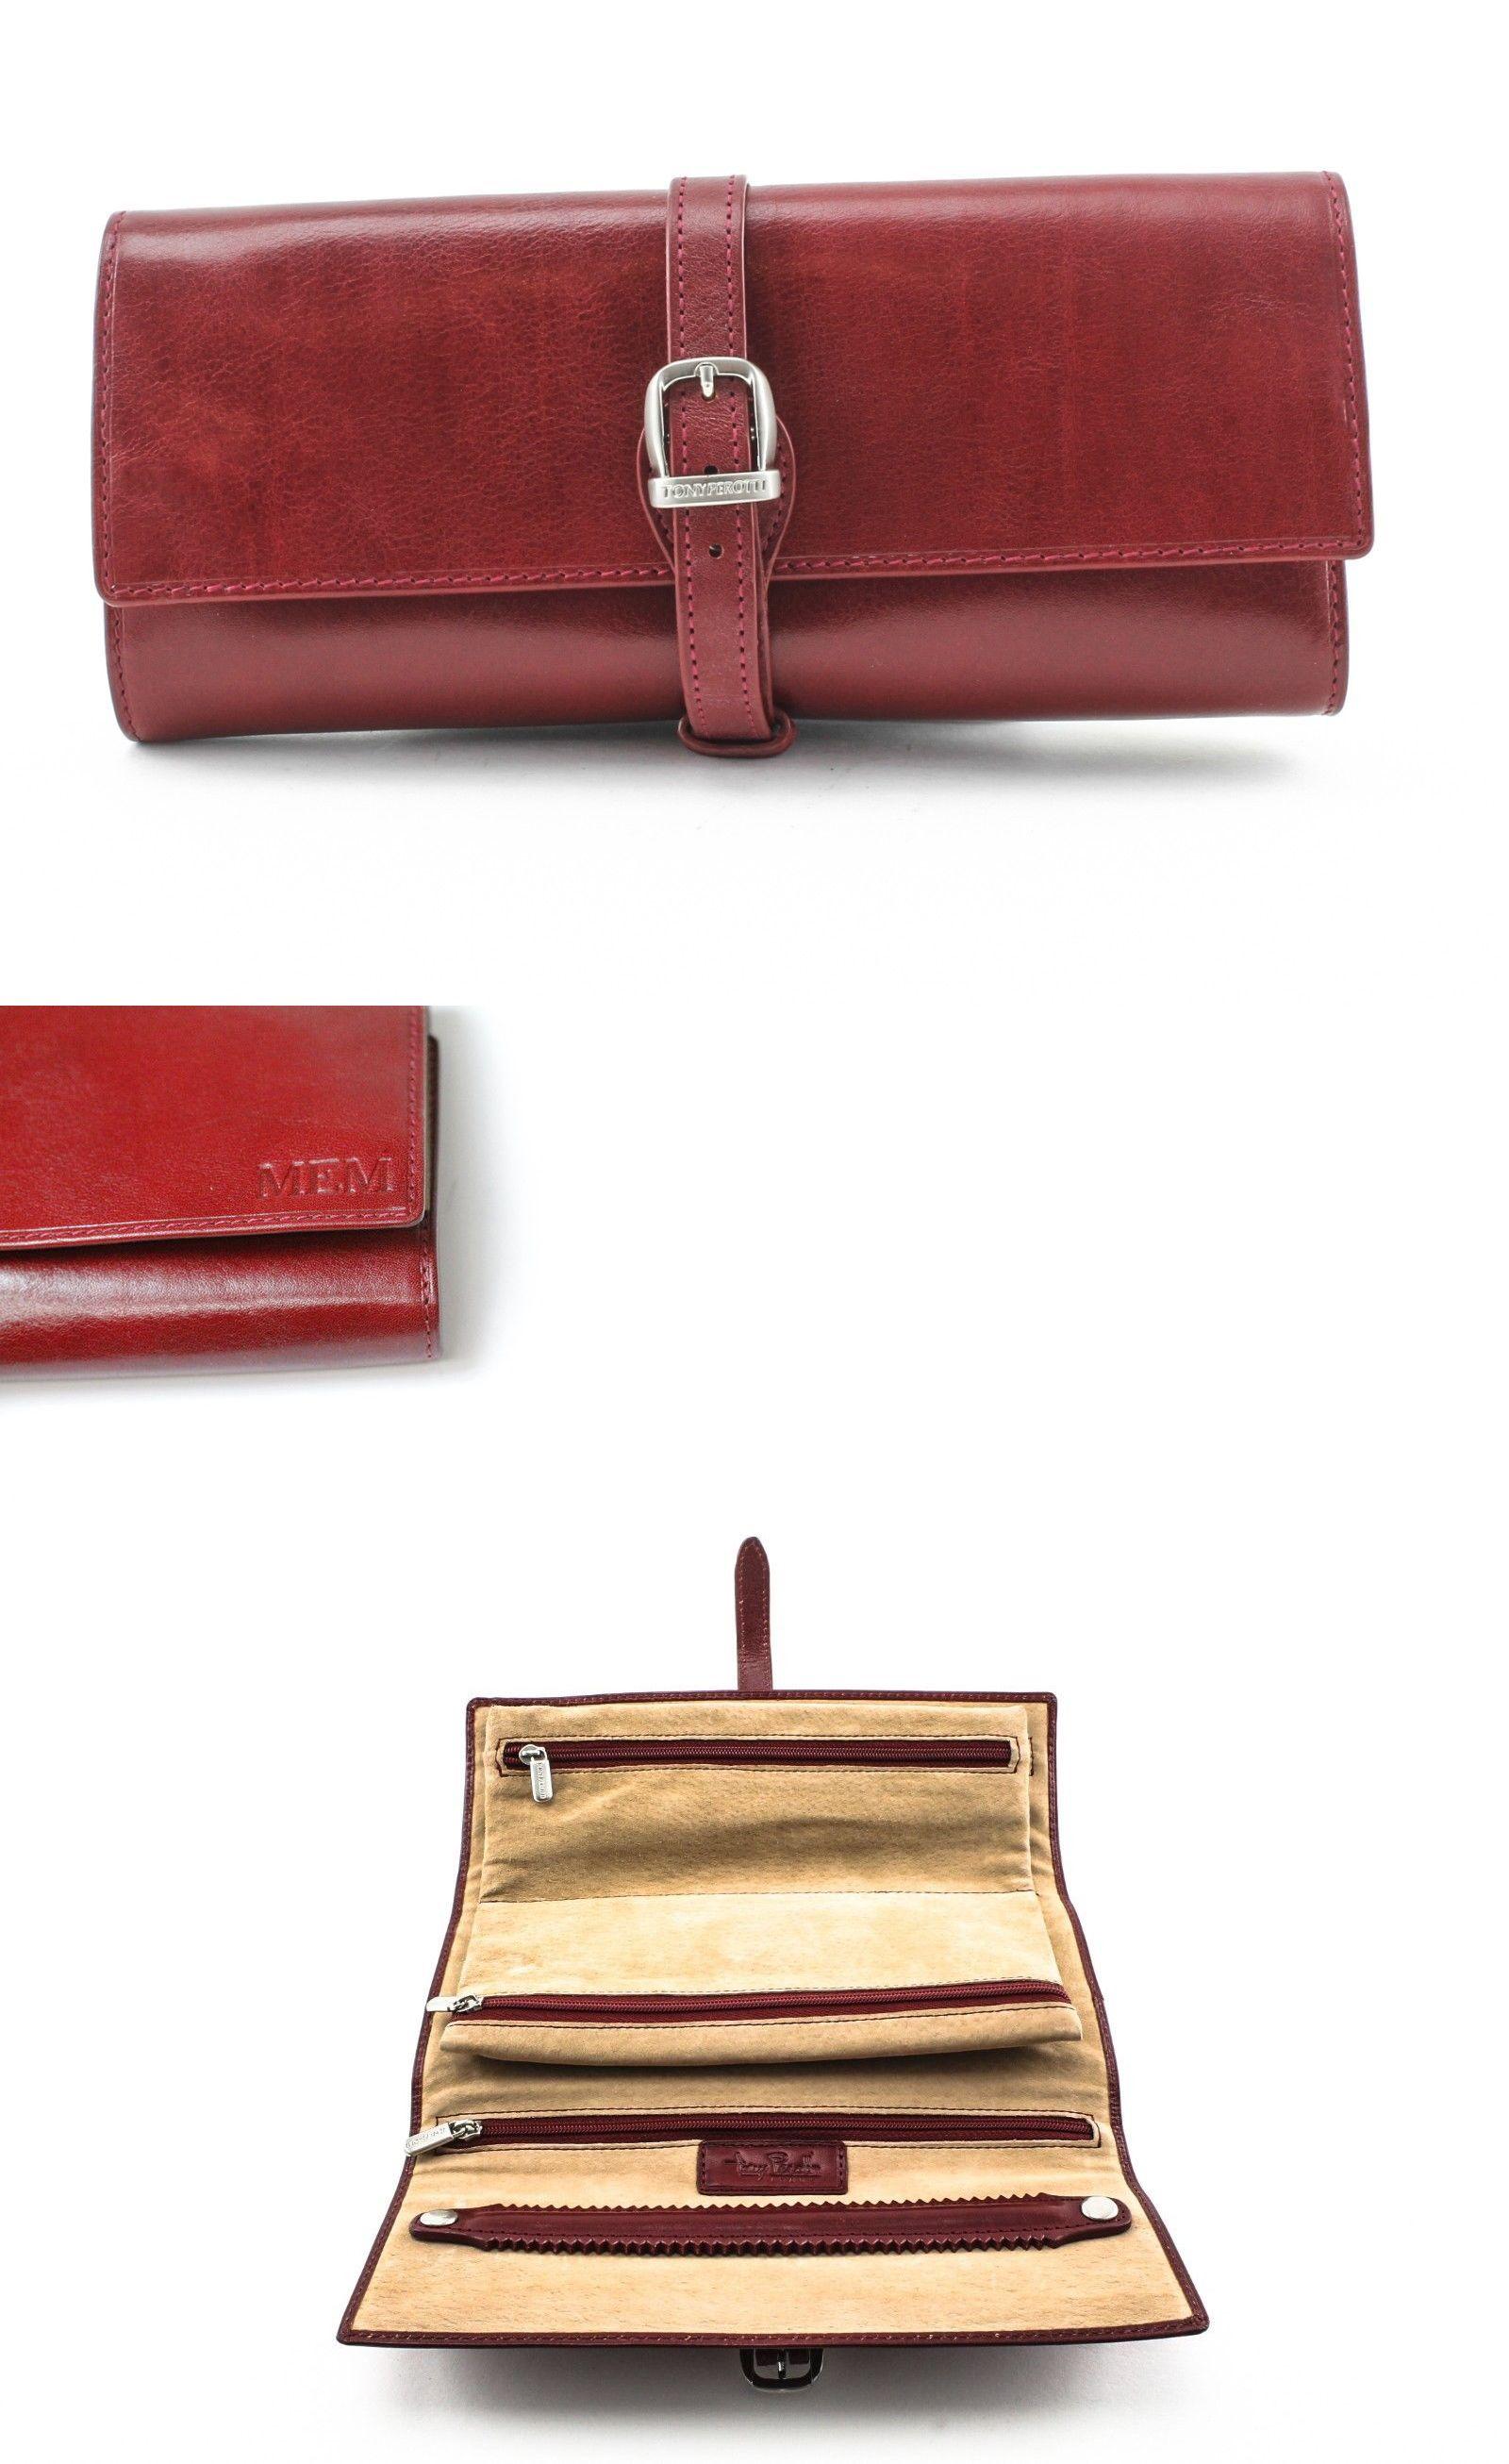 Other Jewelry Organizers 164372 Tony Perotti Italian Leather Grande